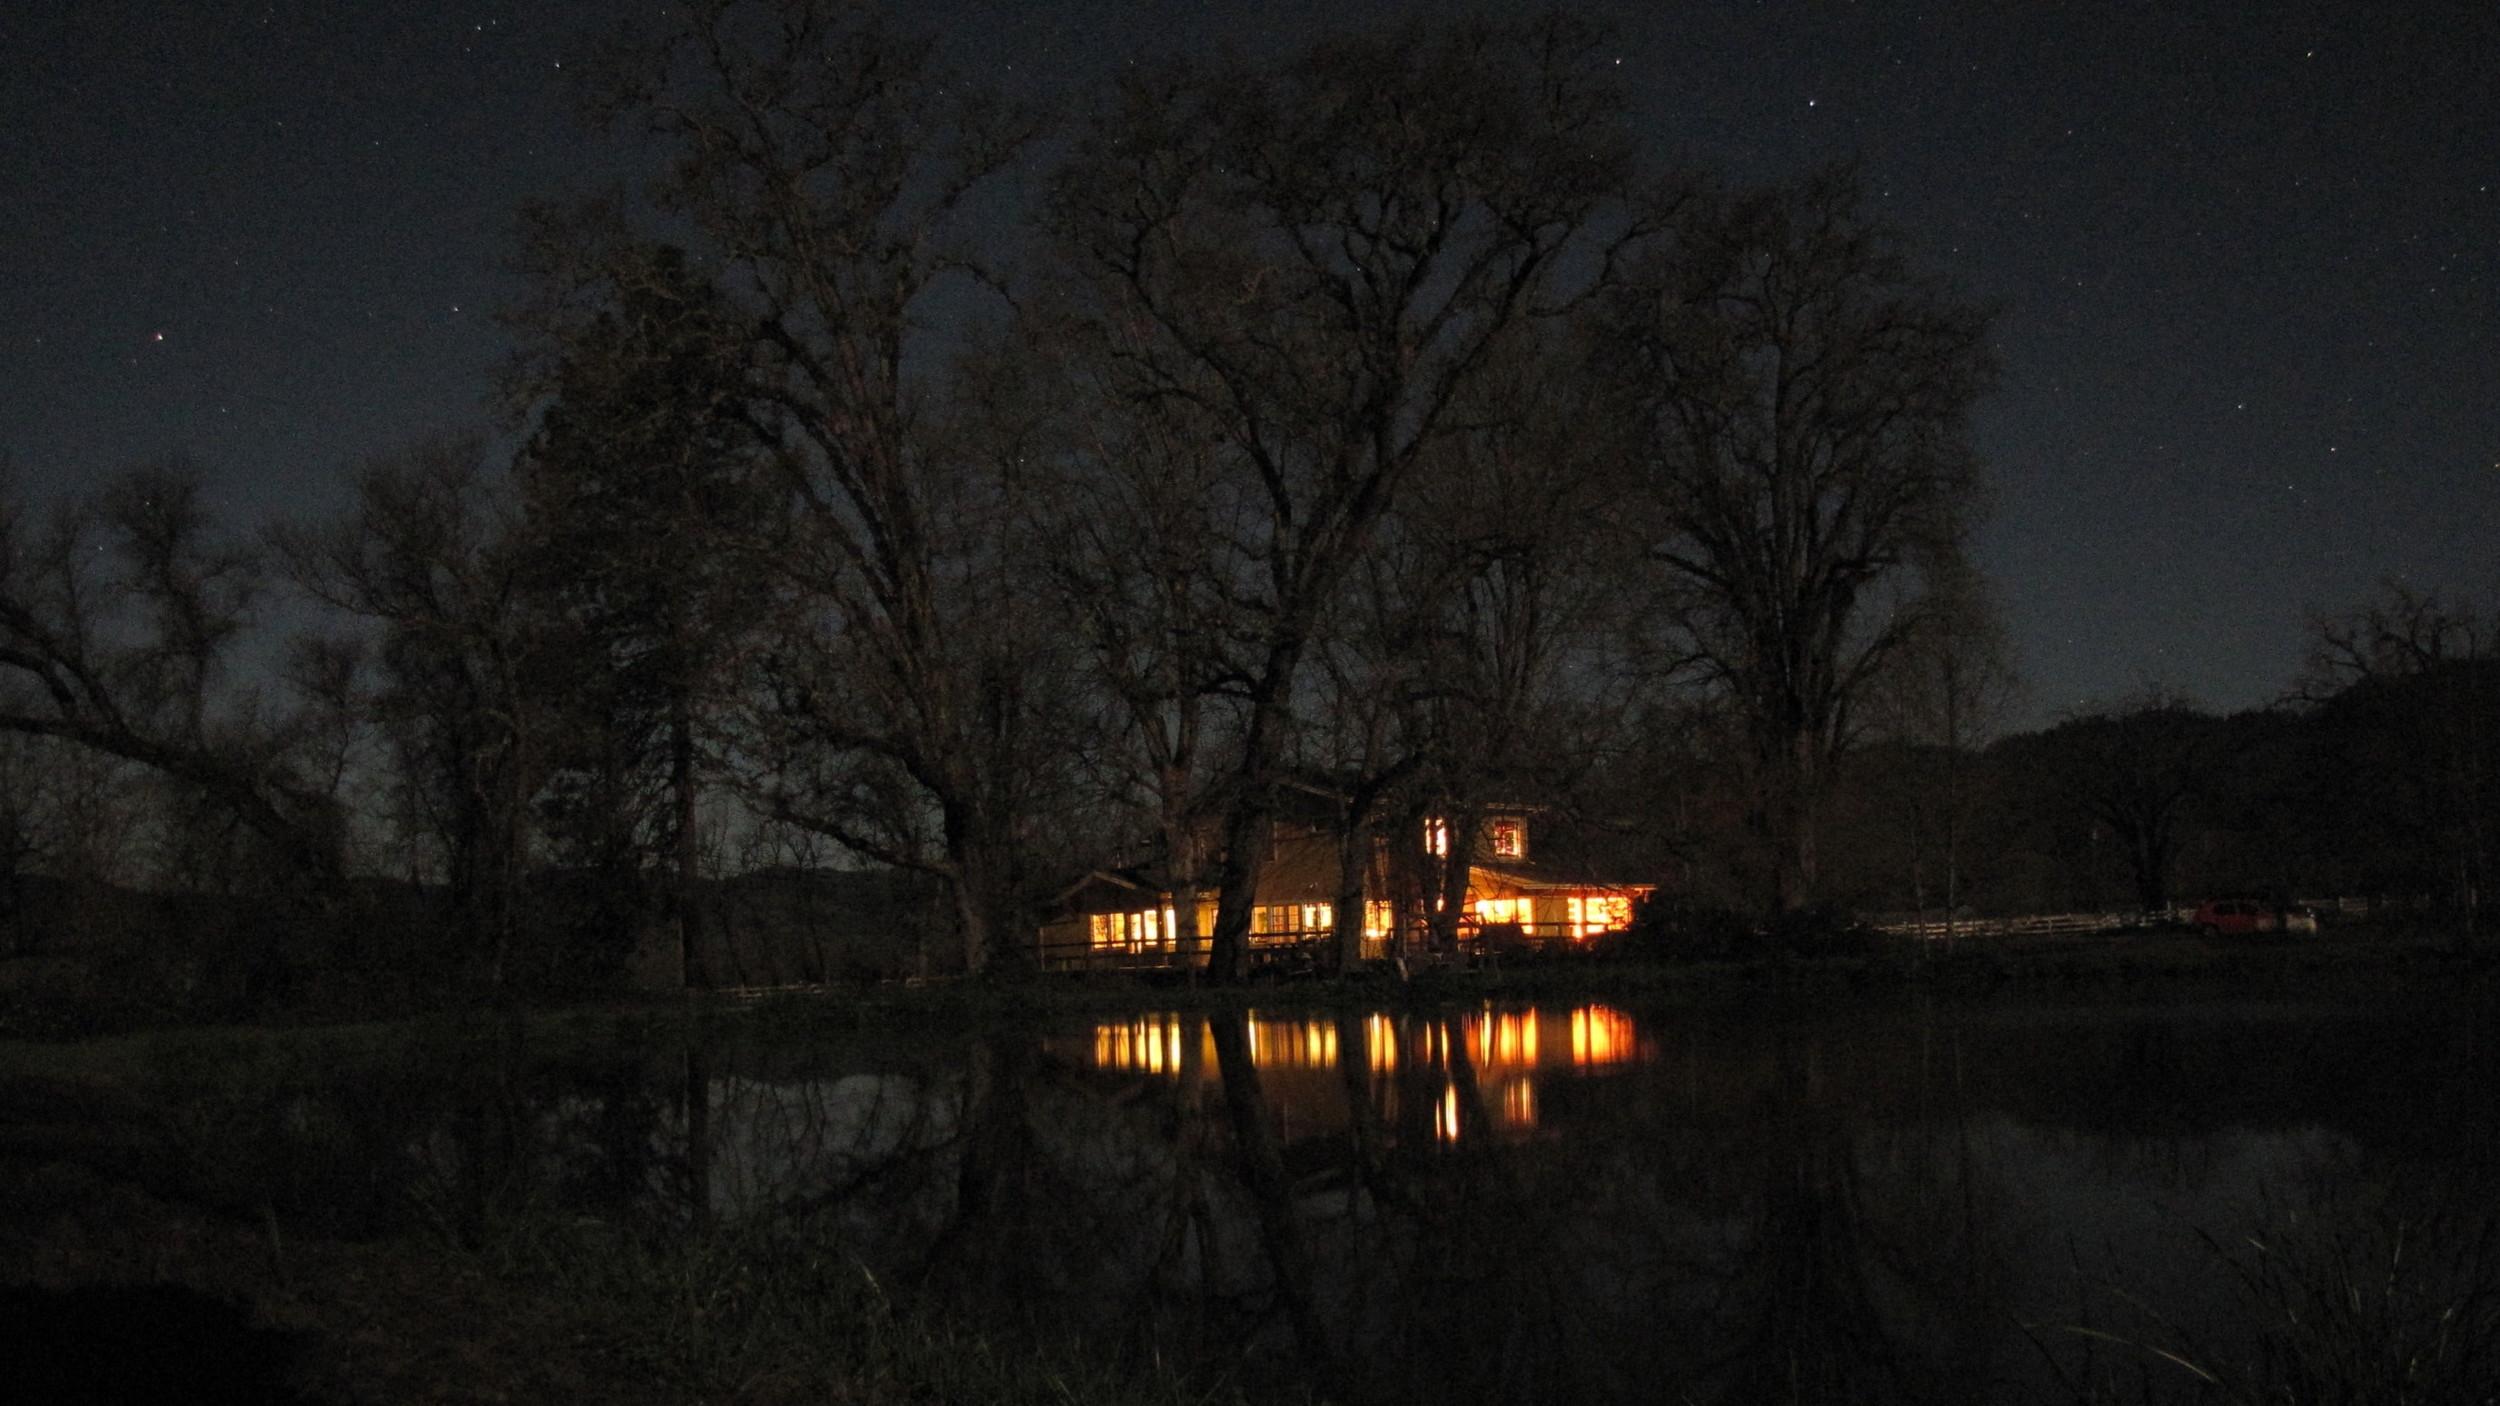 The Farmhouse at night